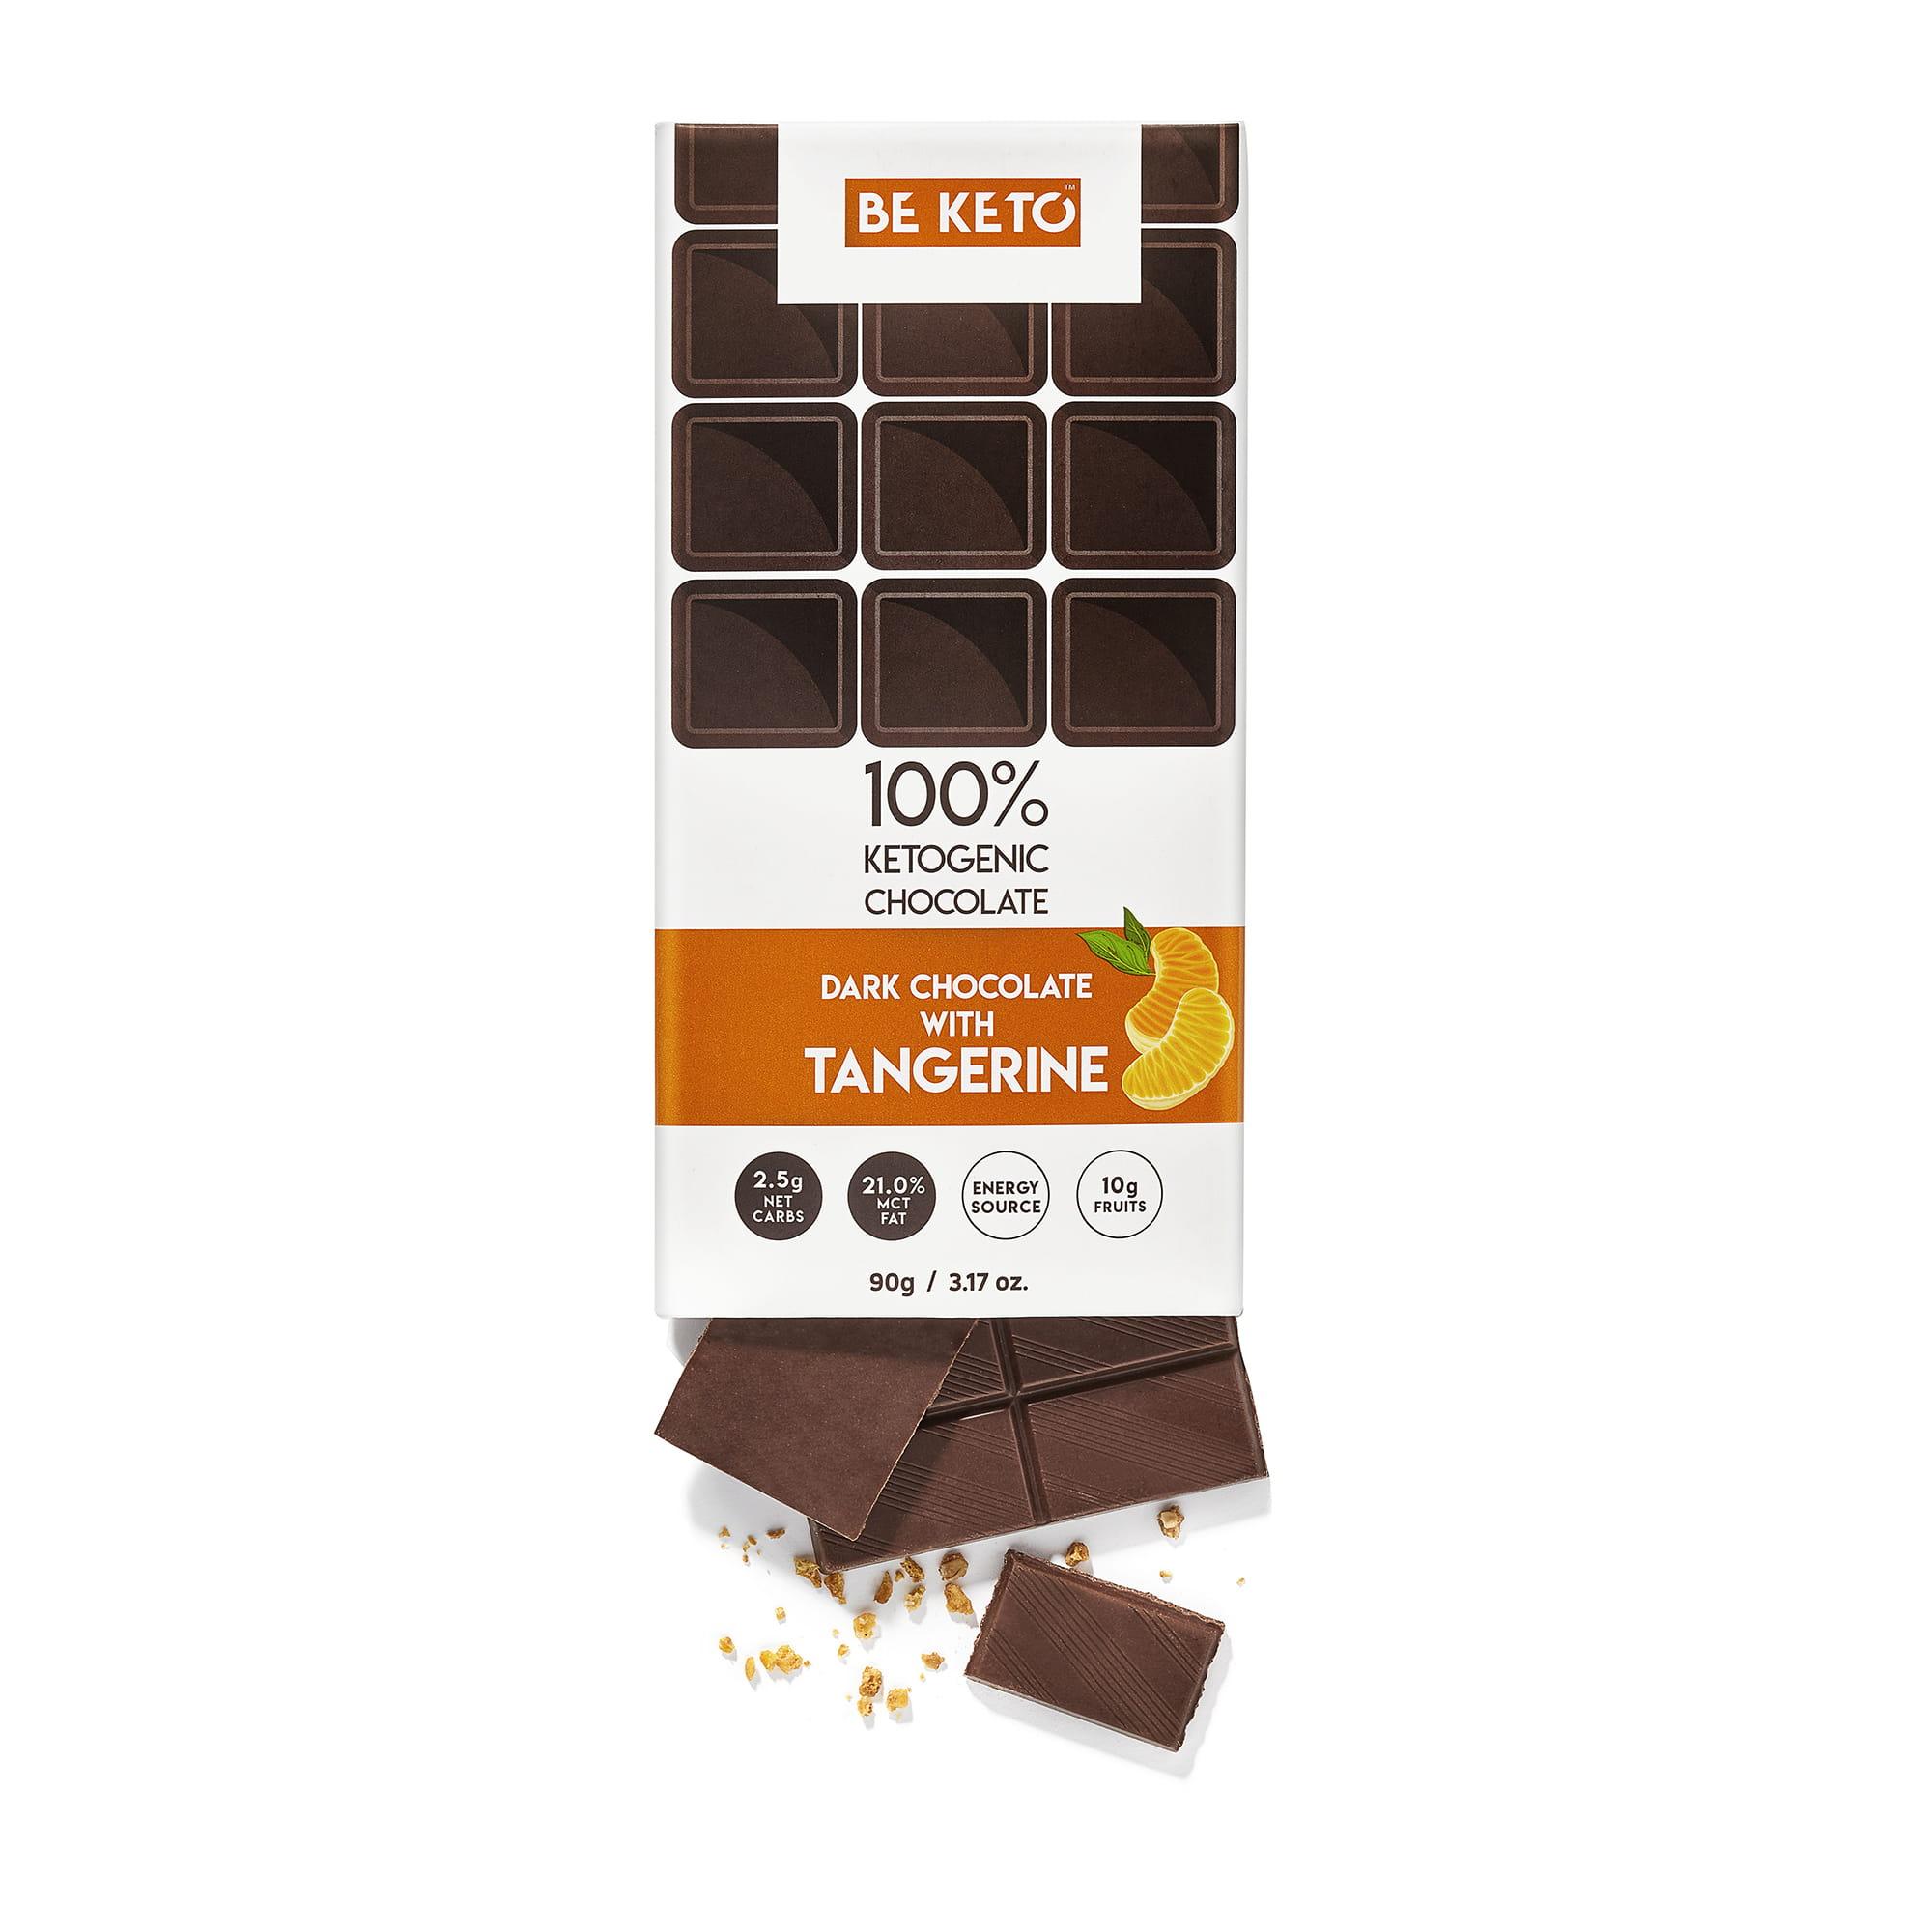 Keto Chocolate + MCT Oil - Tangerine